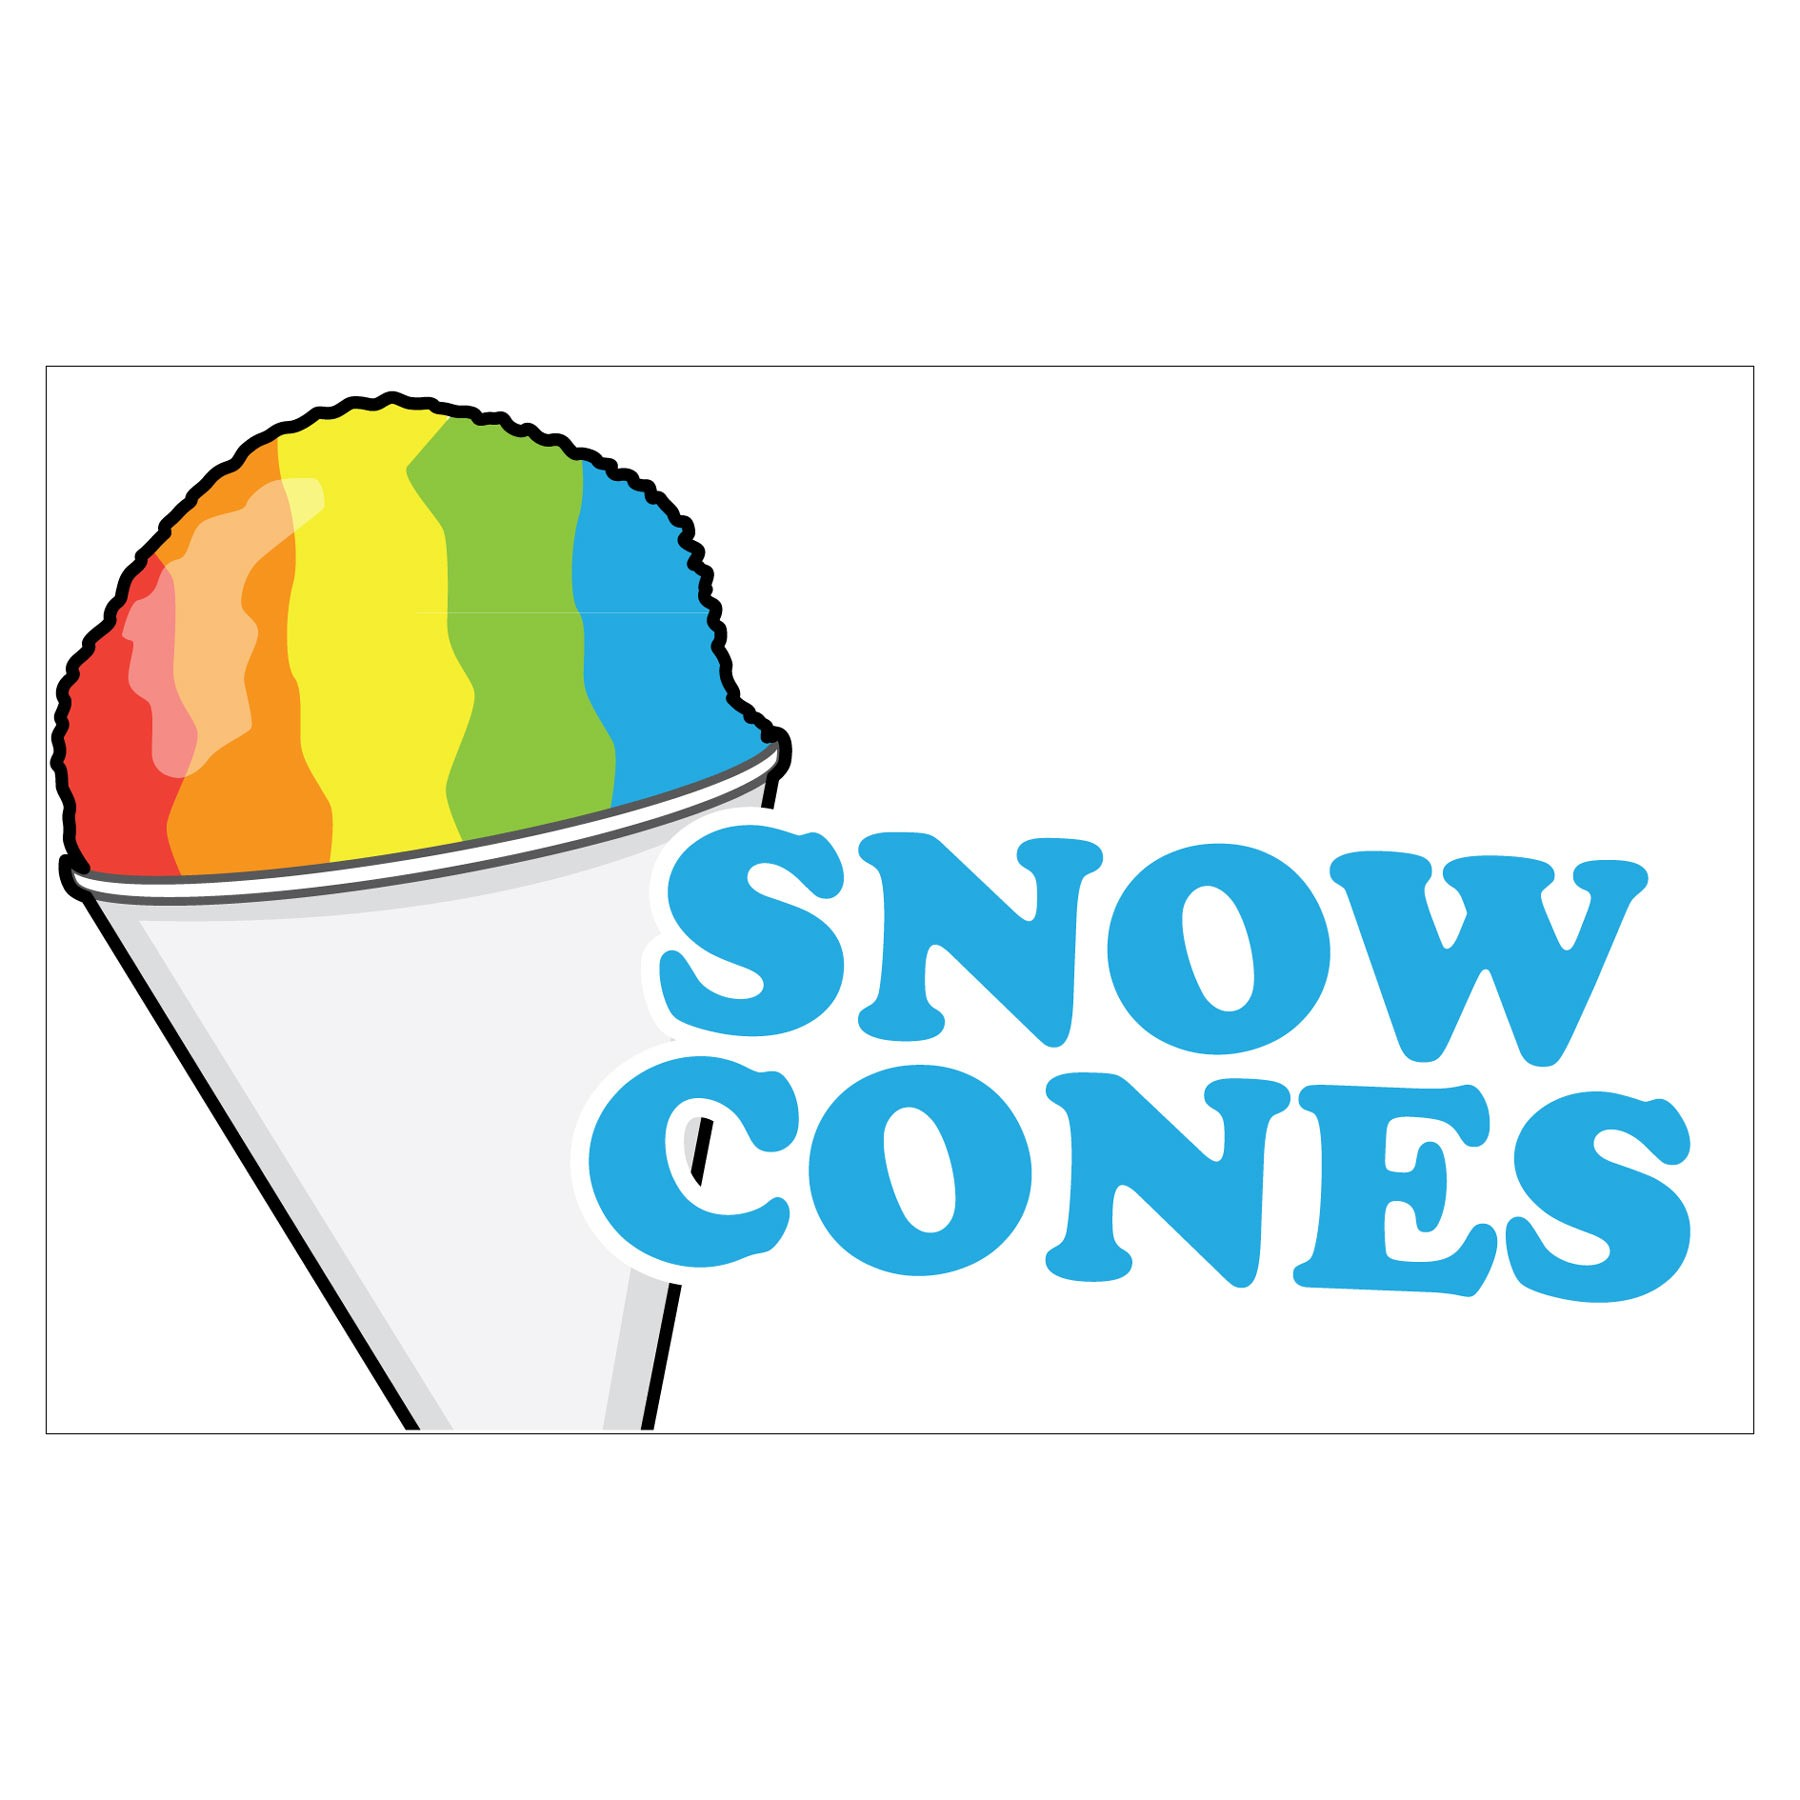 free clipart of snow cones - photo #1